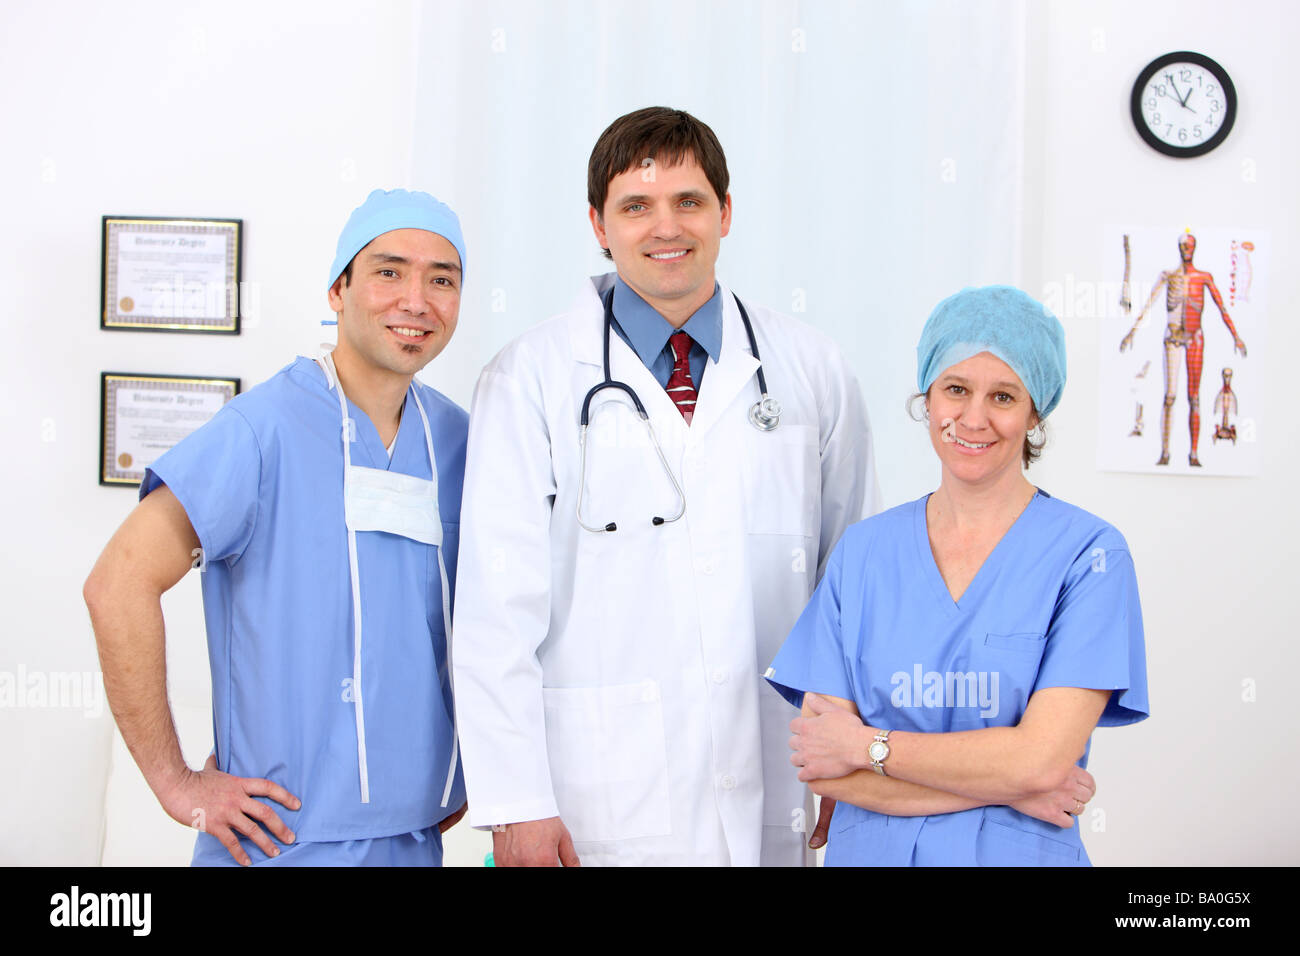 Medical personnel group portrait - Stock Image